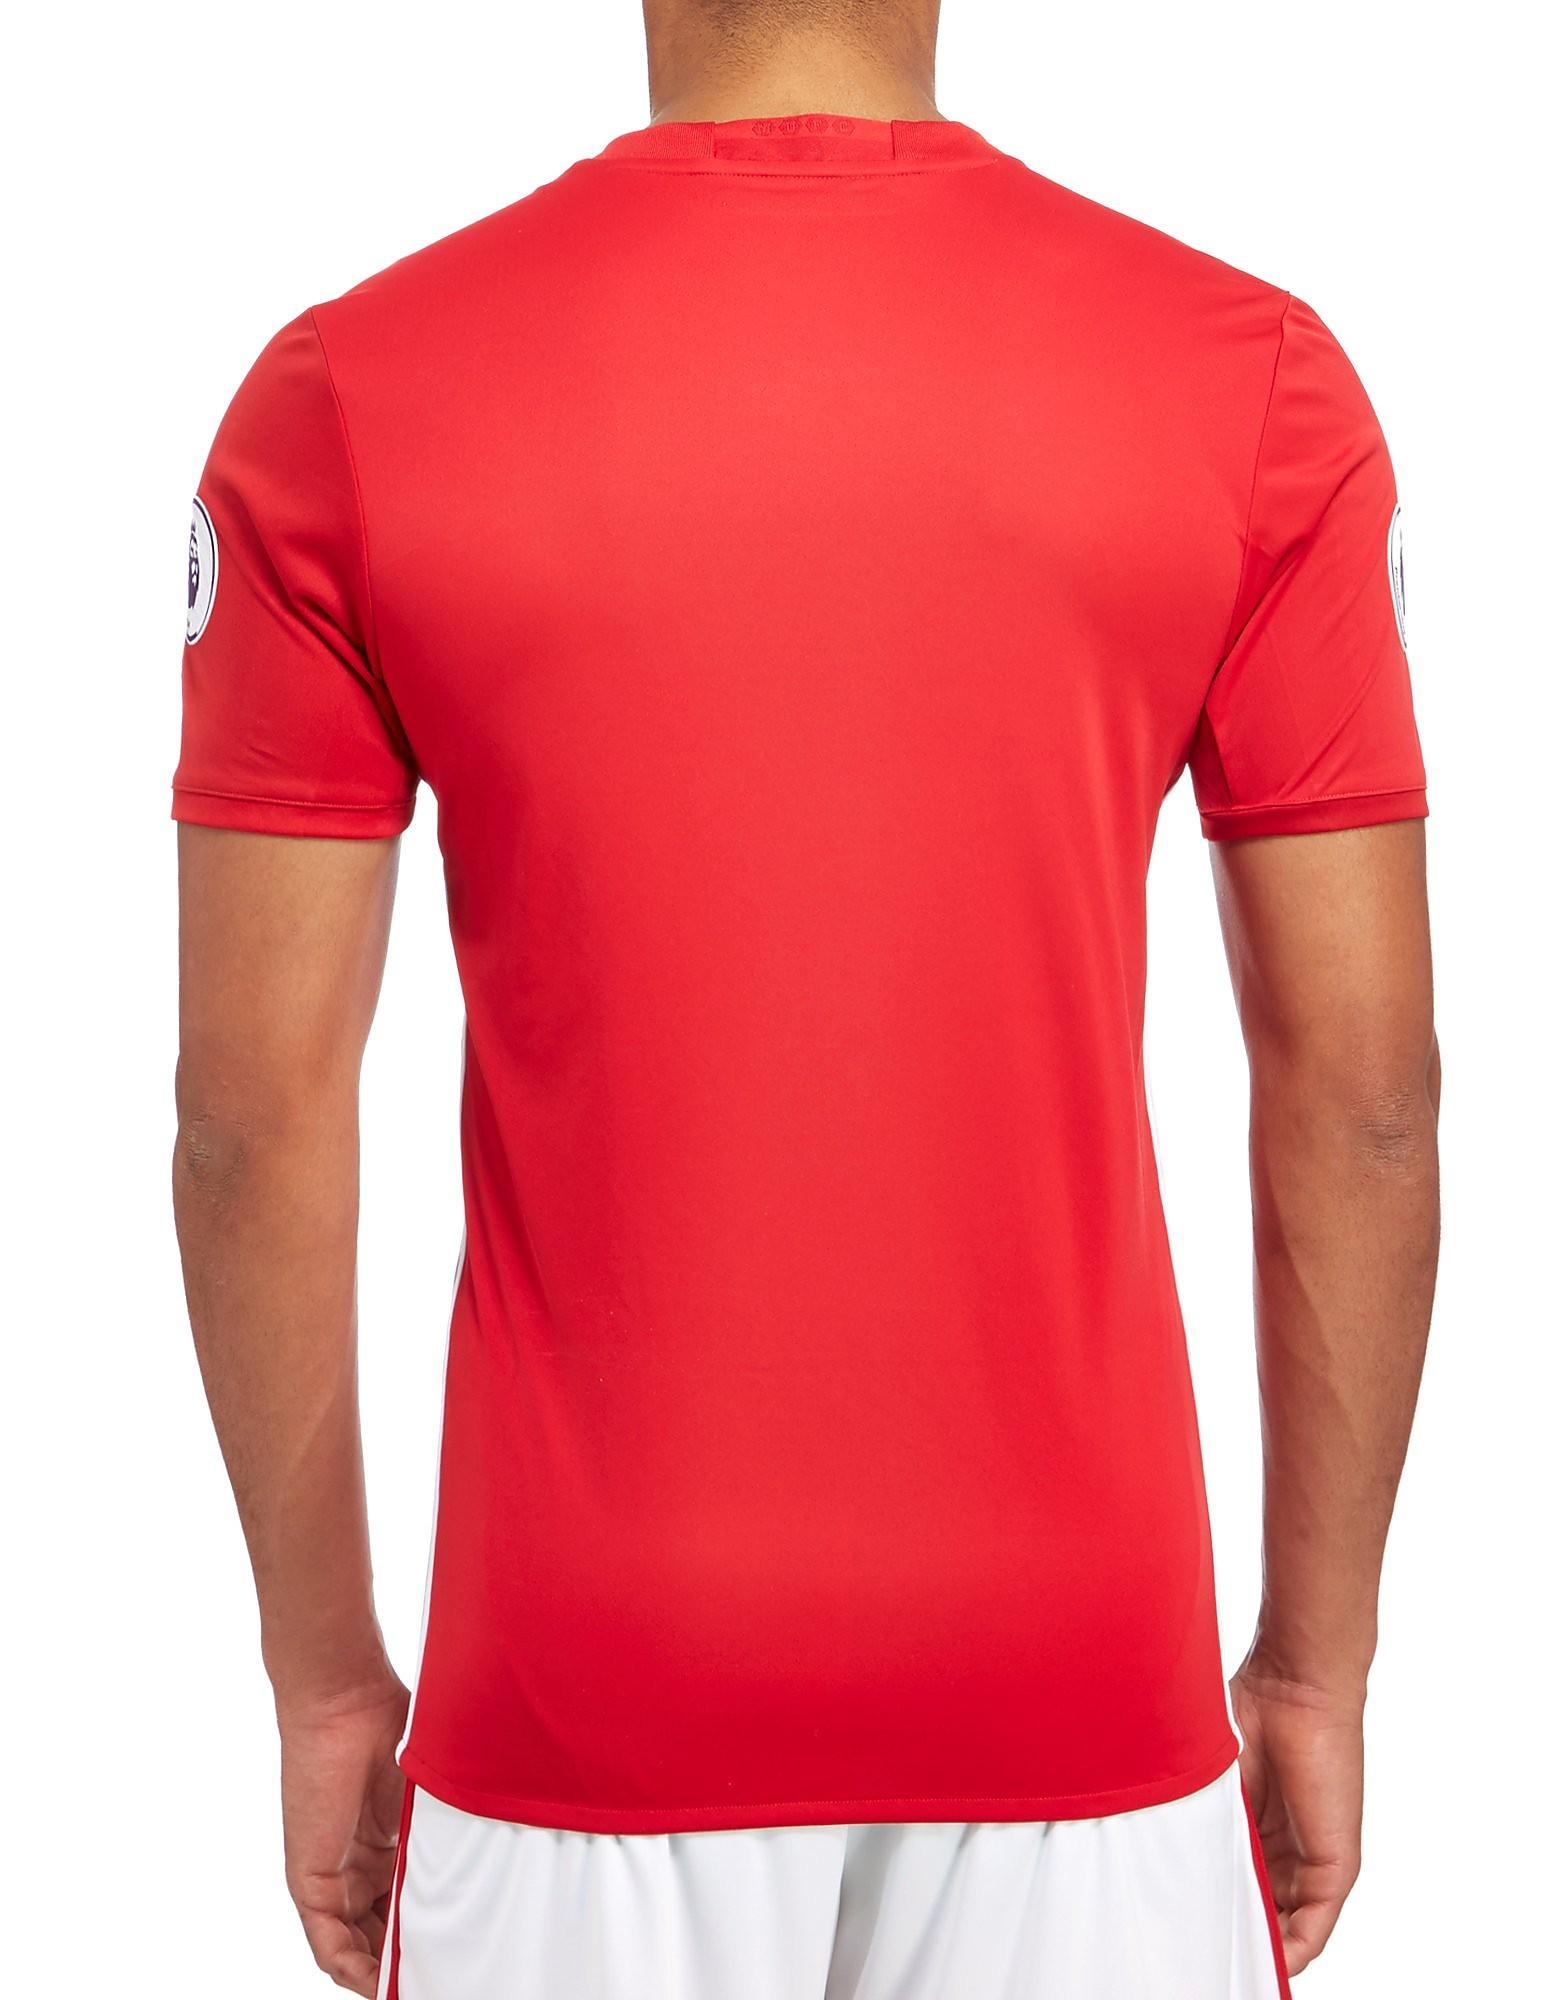 adidas Manchester United 2016/17 Home Prem Badge Shirt